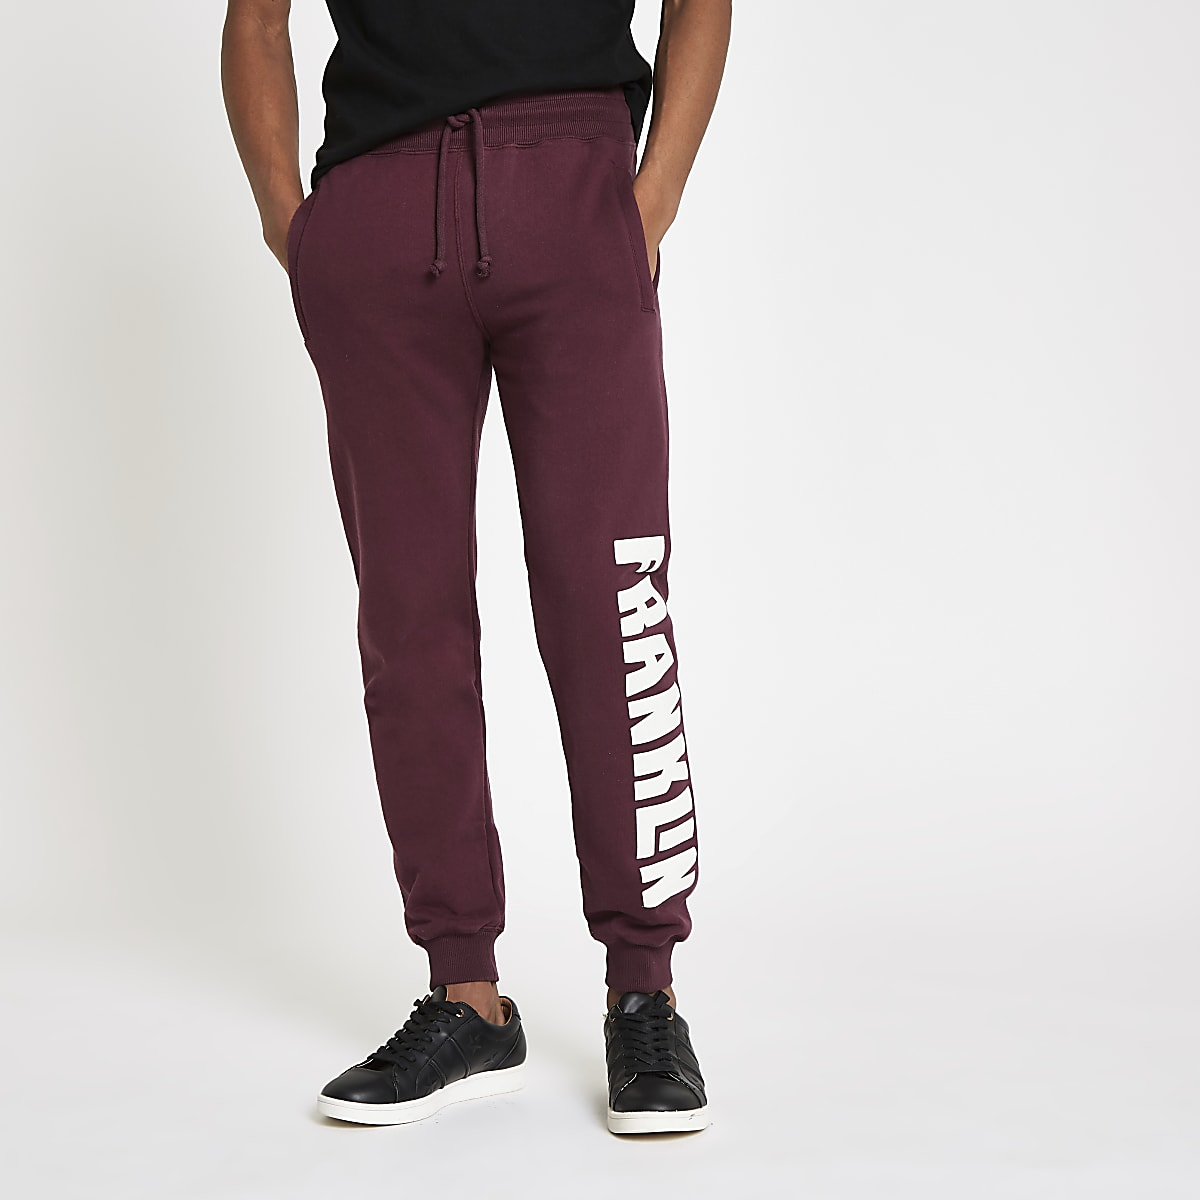 38b43e1a952 ... Franklin   Marshall – Pantalon de jogging en molleton bordeaux ...